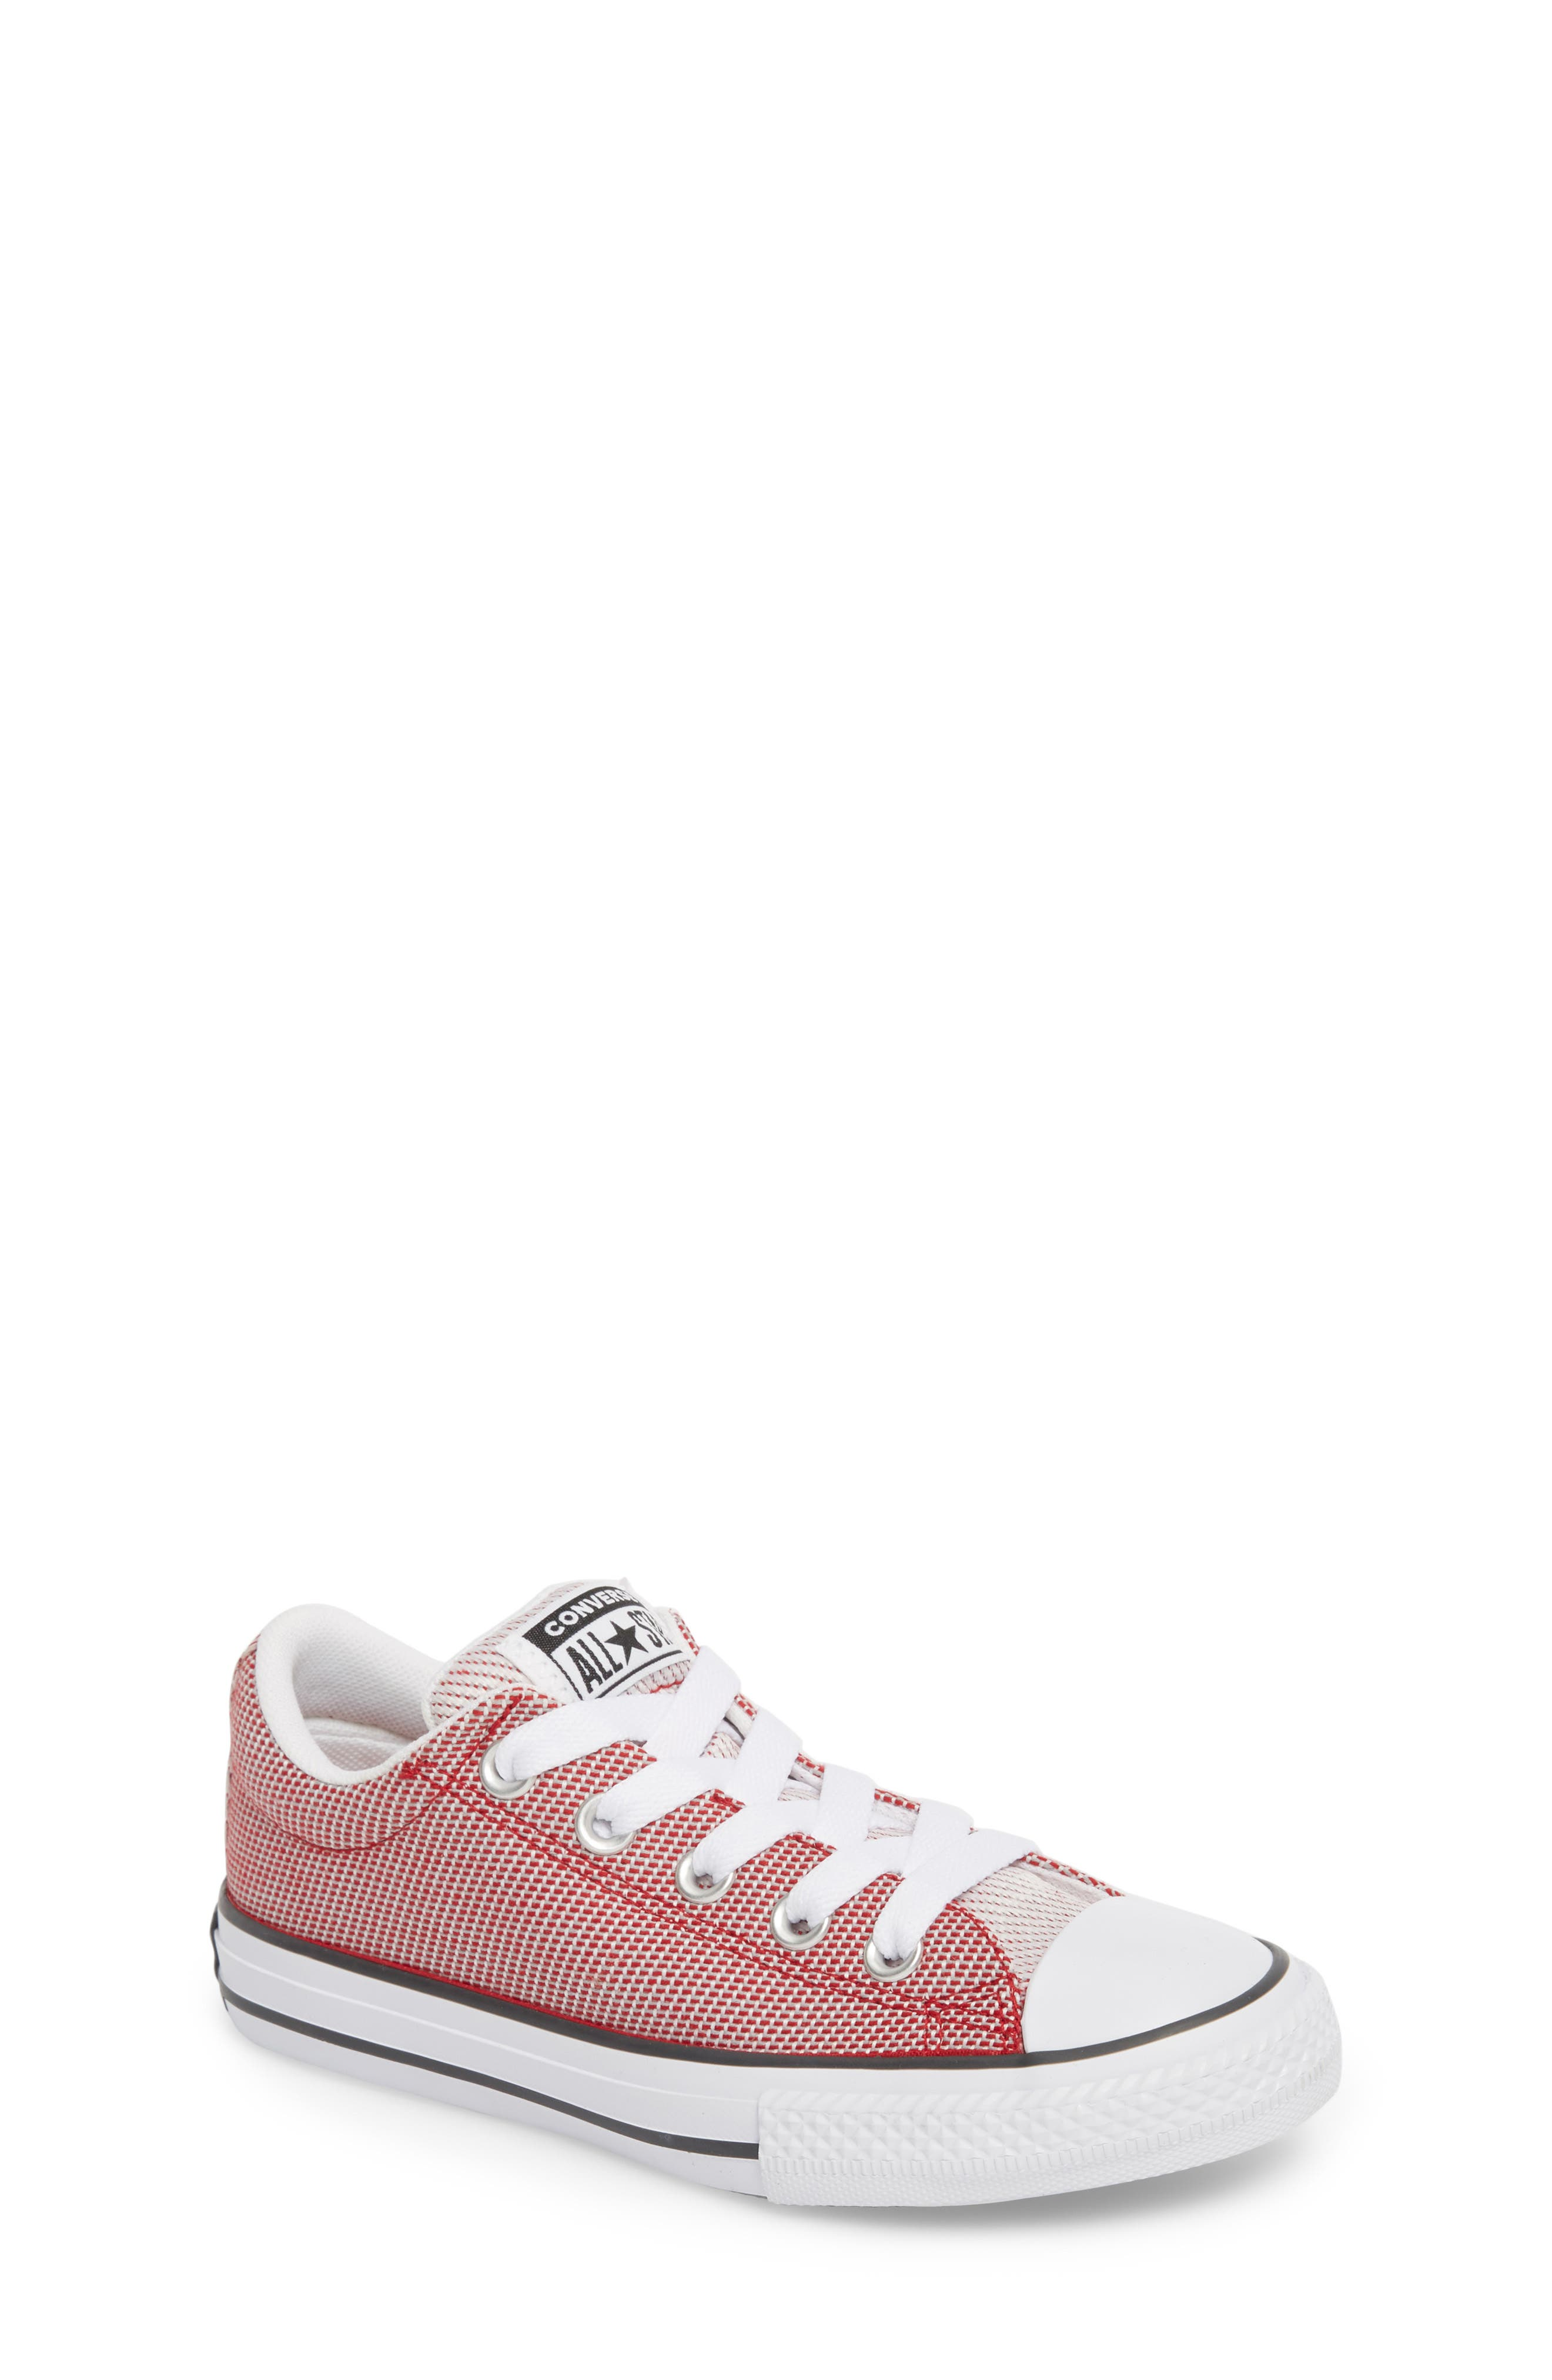 Converse Chuck Taylor® All Star® Woven Street Sneaker (Baby, Walker, Toddler, Little Kid & Big Kid)